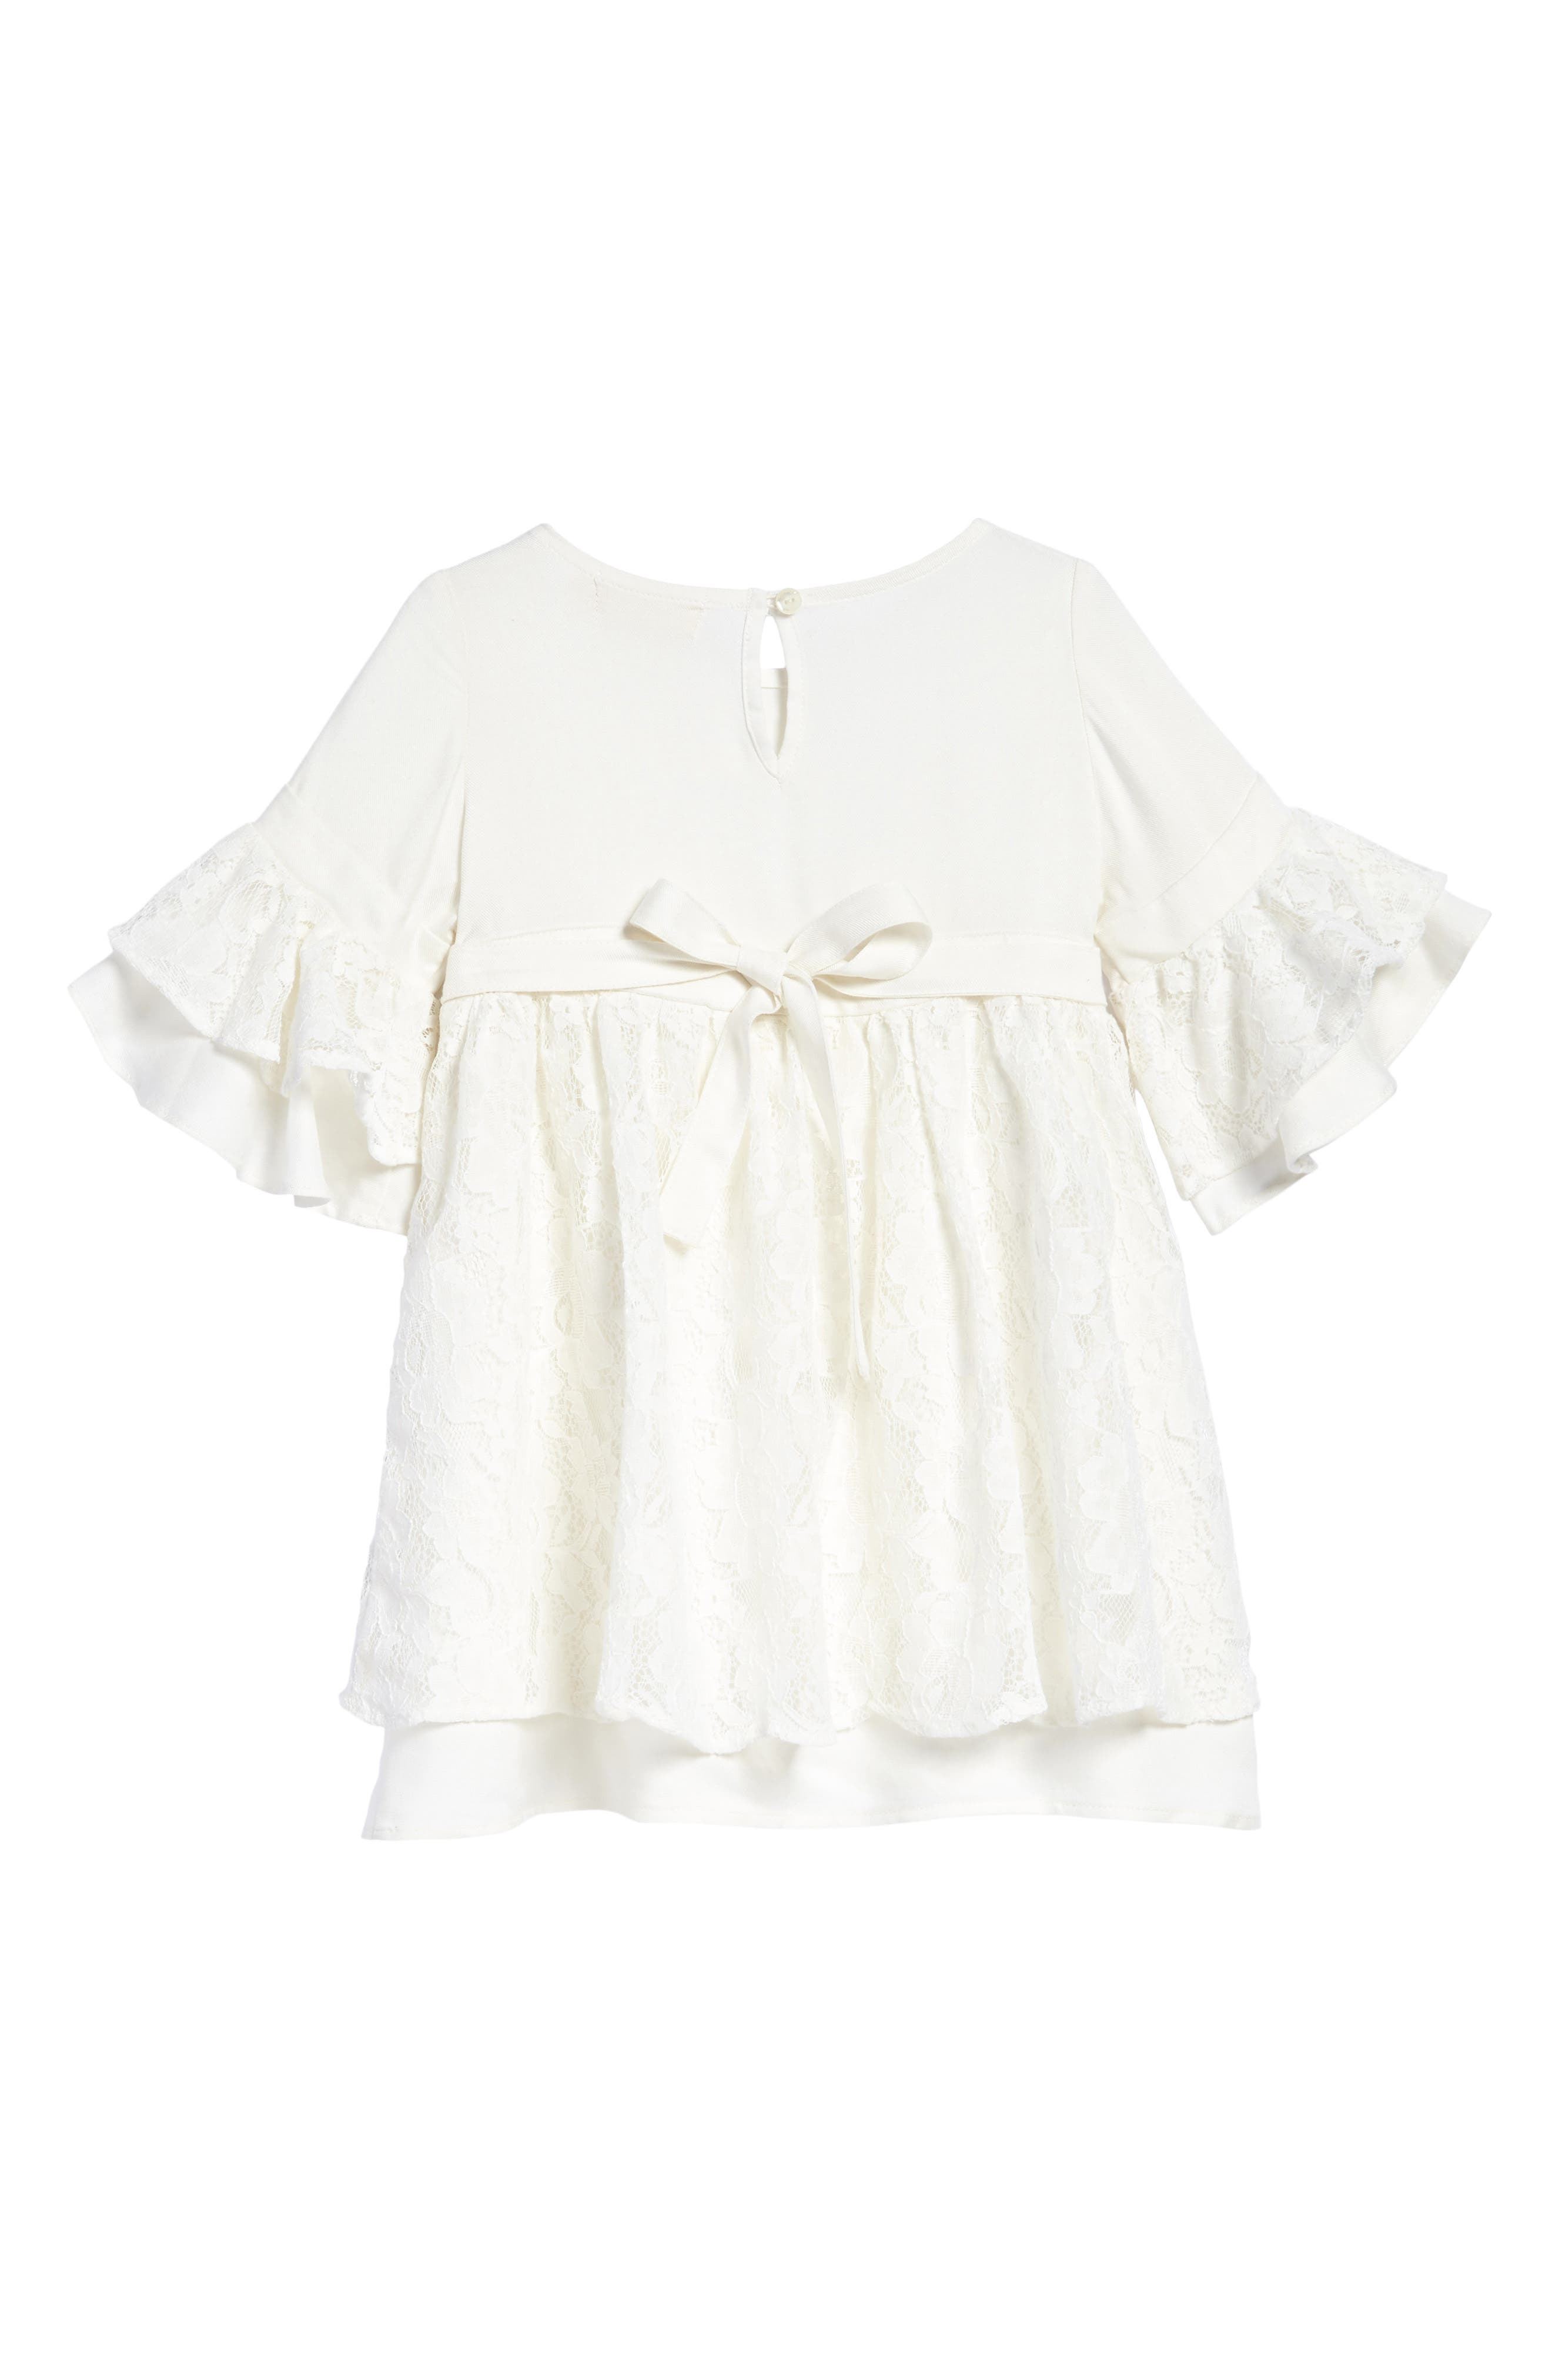 Lyla Lace Dress,                             Alternate thumbnail 2, color,                             Ivory